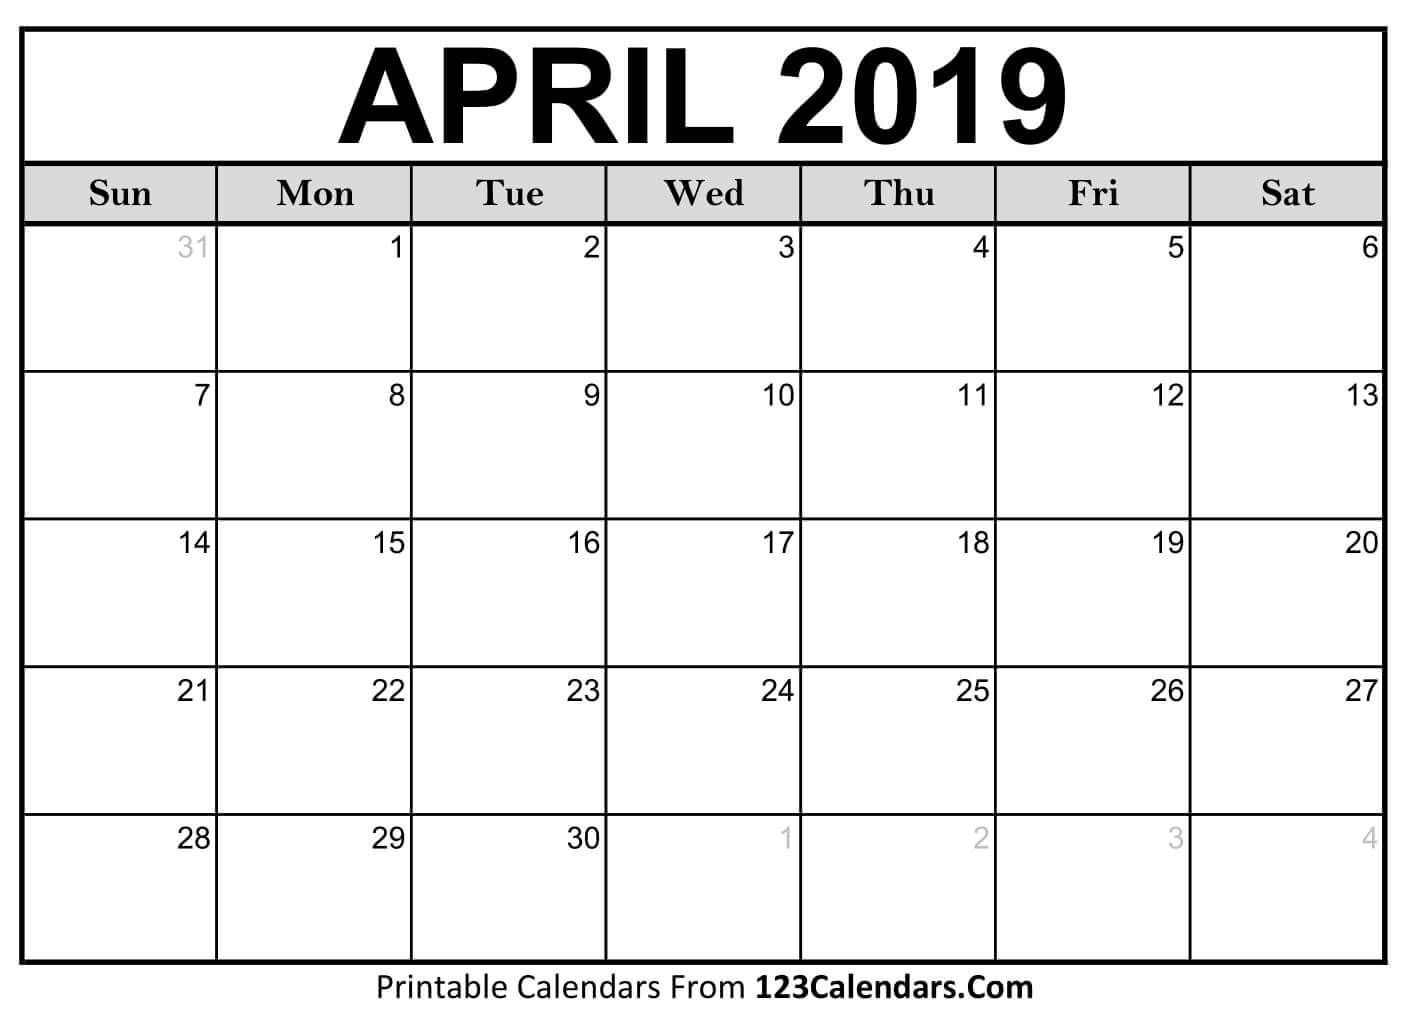 Printable April 2019 Calendar Templates - 123Calendars Free